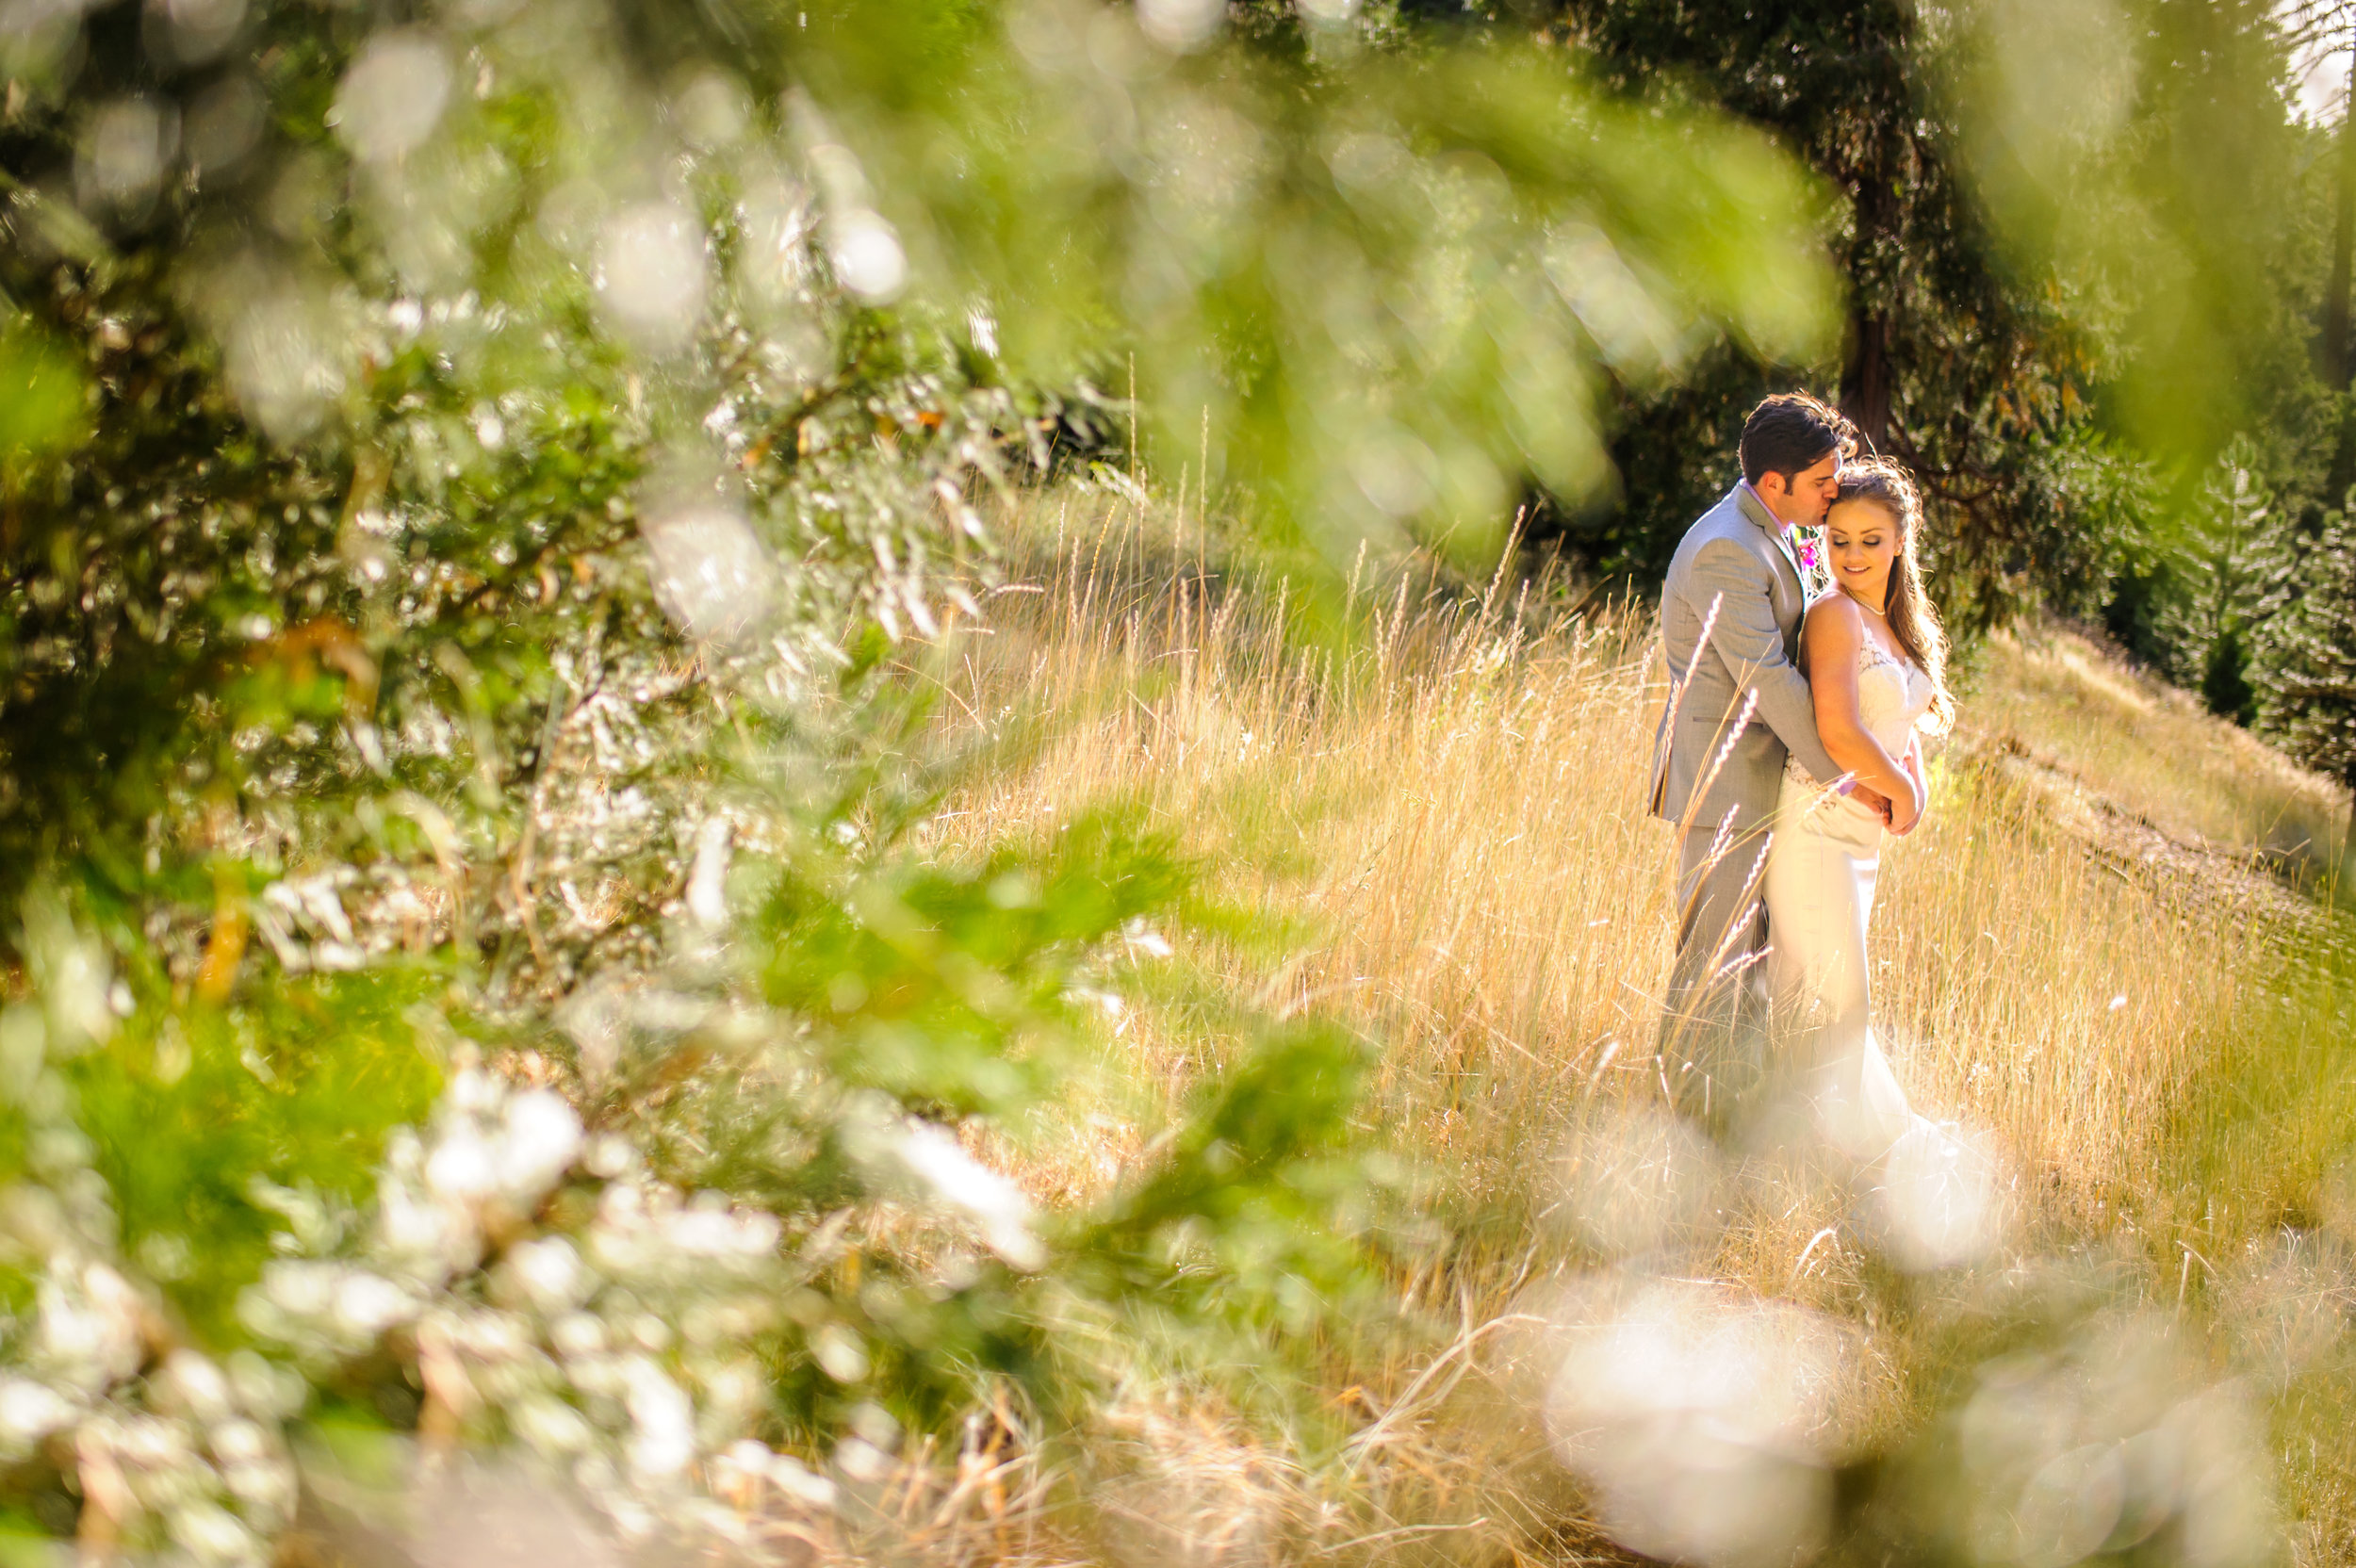 becca-jacob-028-tenaya-lodge-yosemite-wedding-photographer-katherine-nicole-photography.JPG